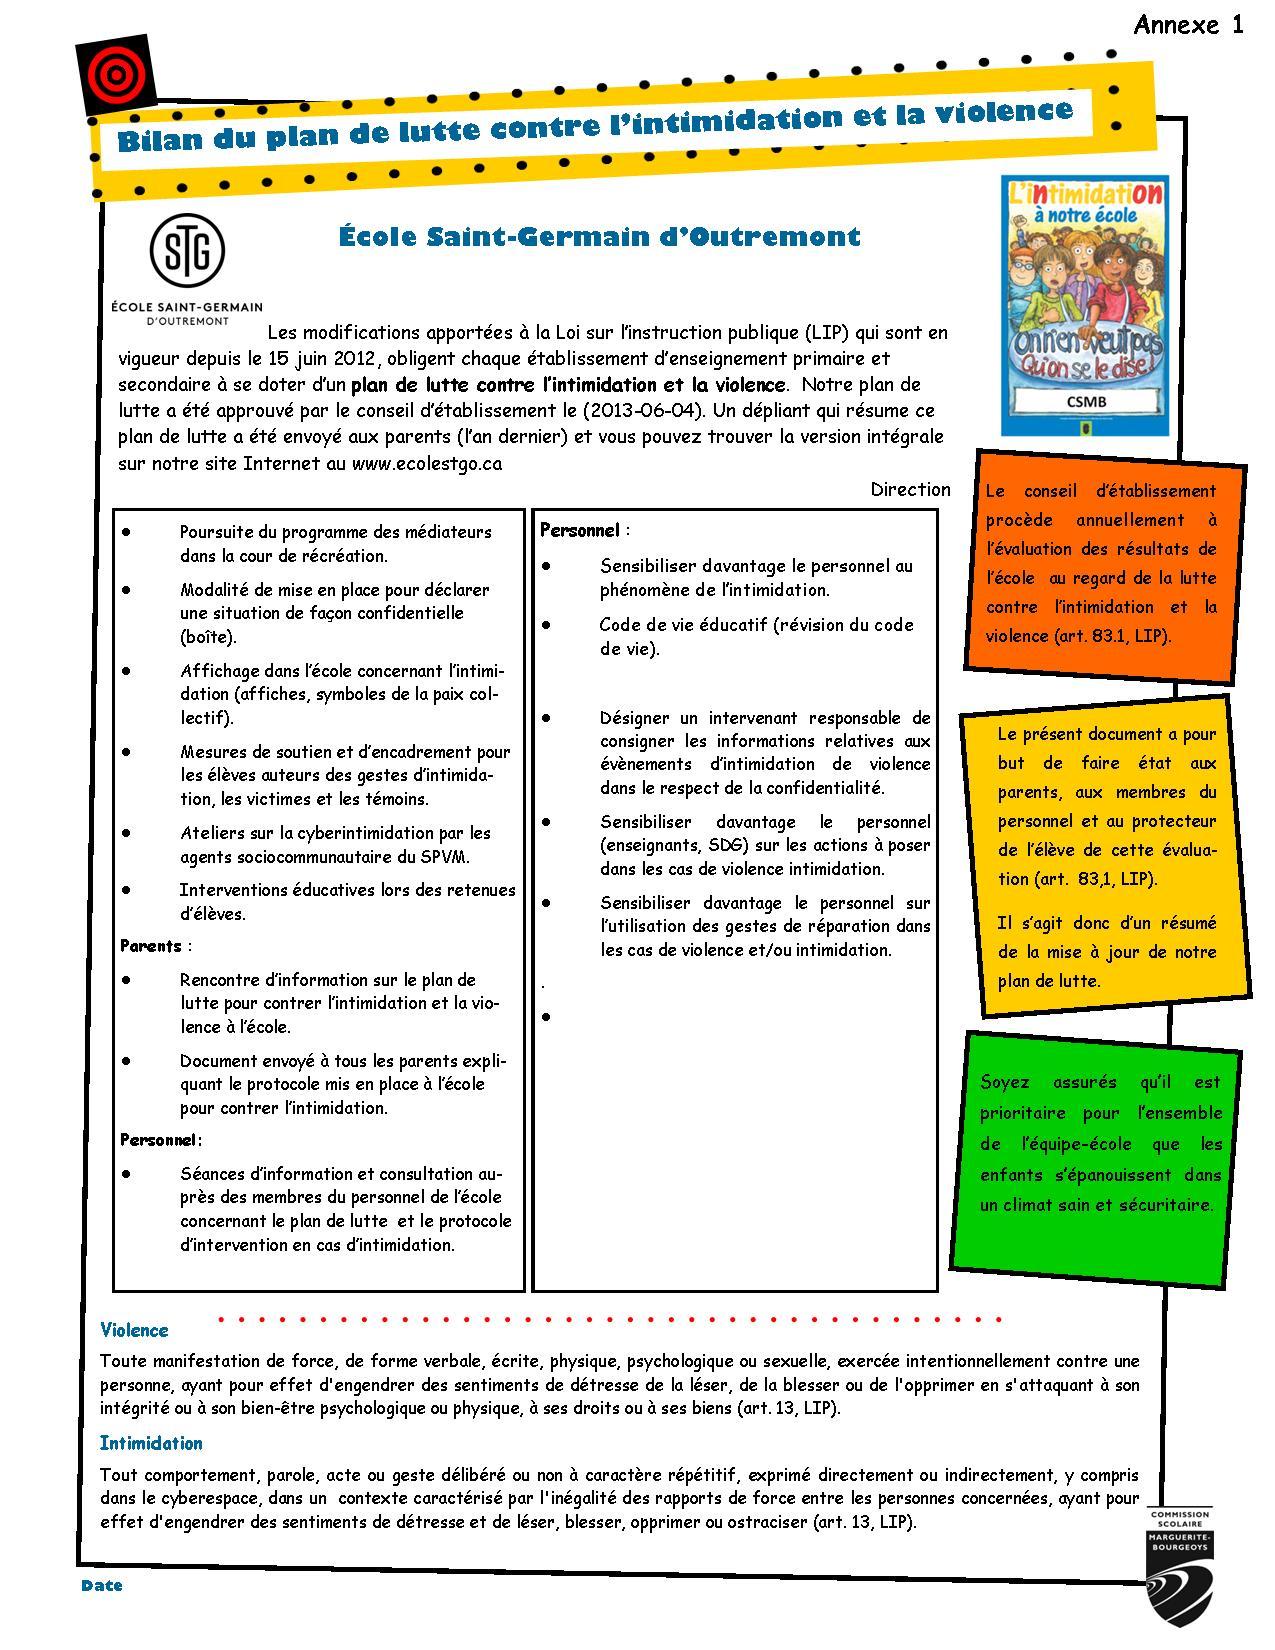 Annexe 1 Diffusion bilan plan de lutte 2014-2015 page 2 corr